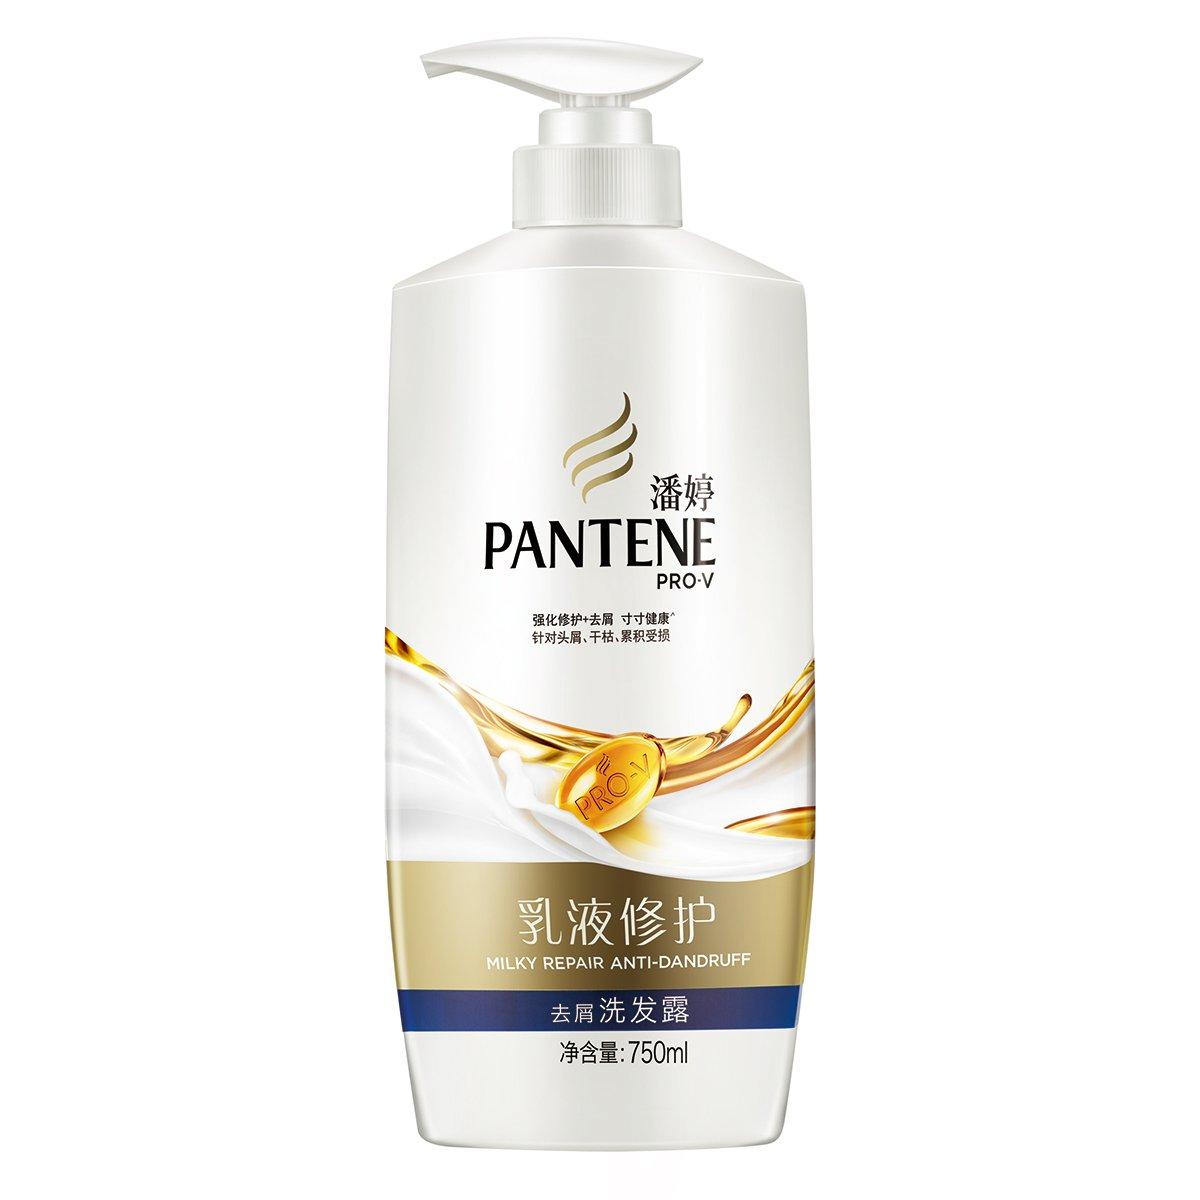 Pantene230mlpantene Pantene Anti Dandruf 750ml